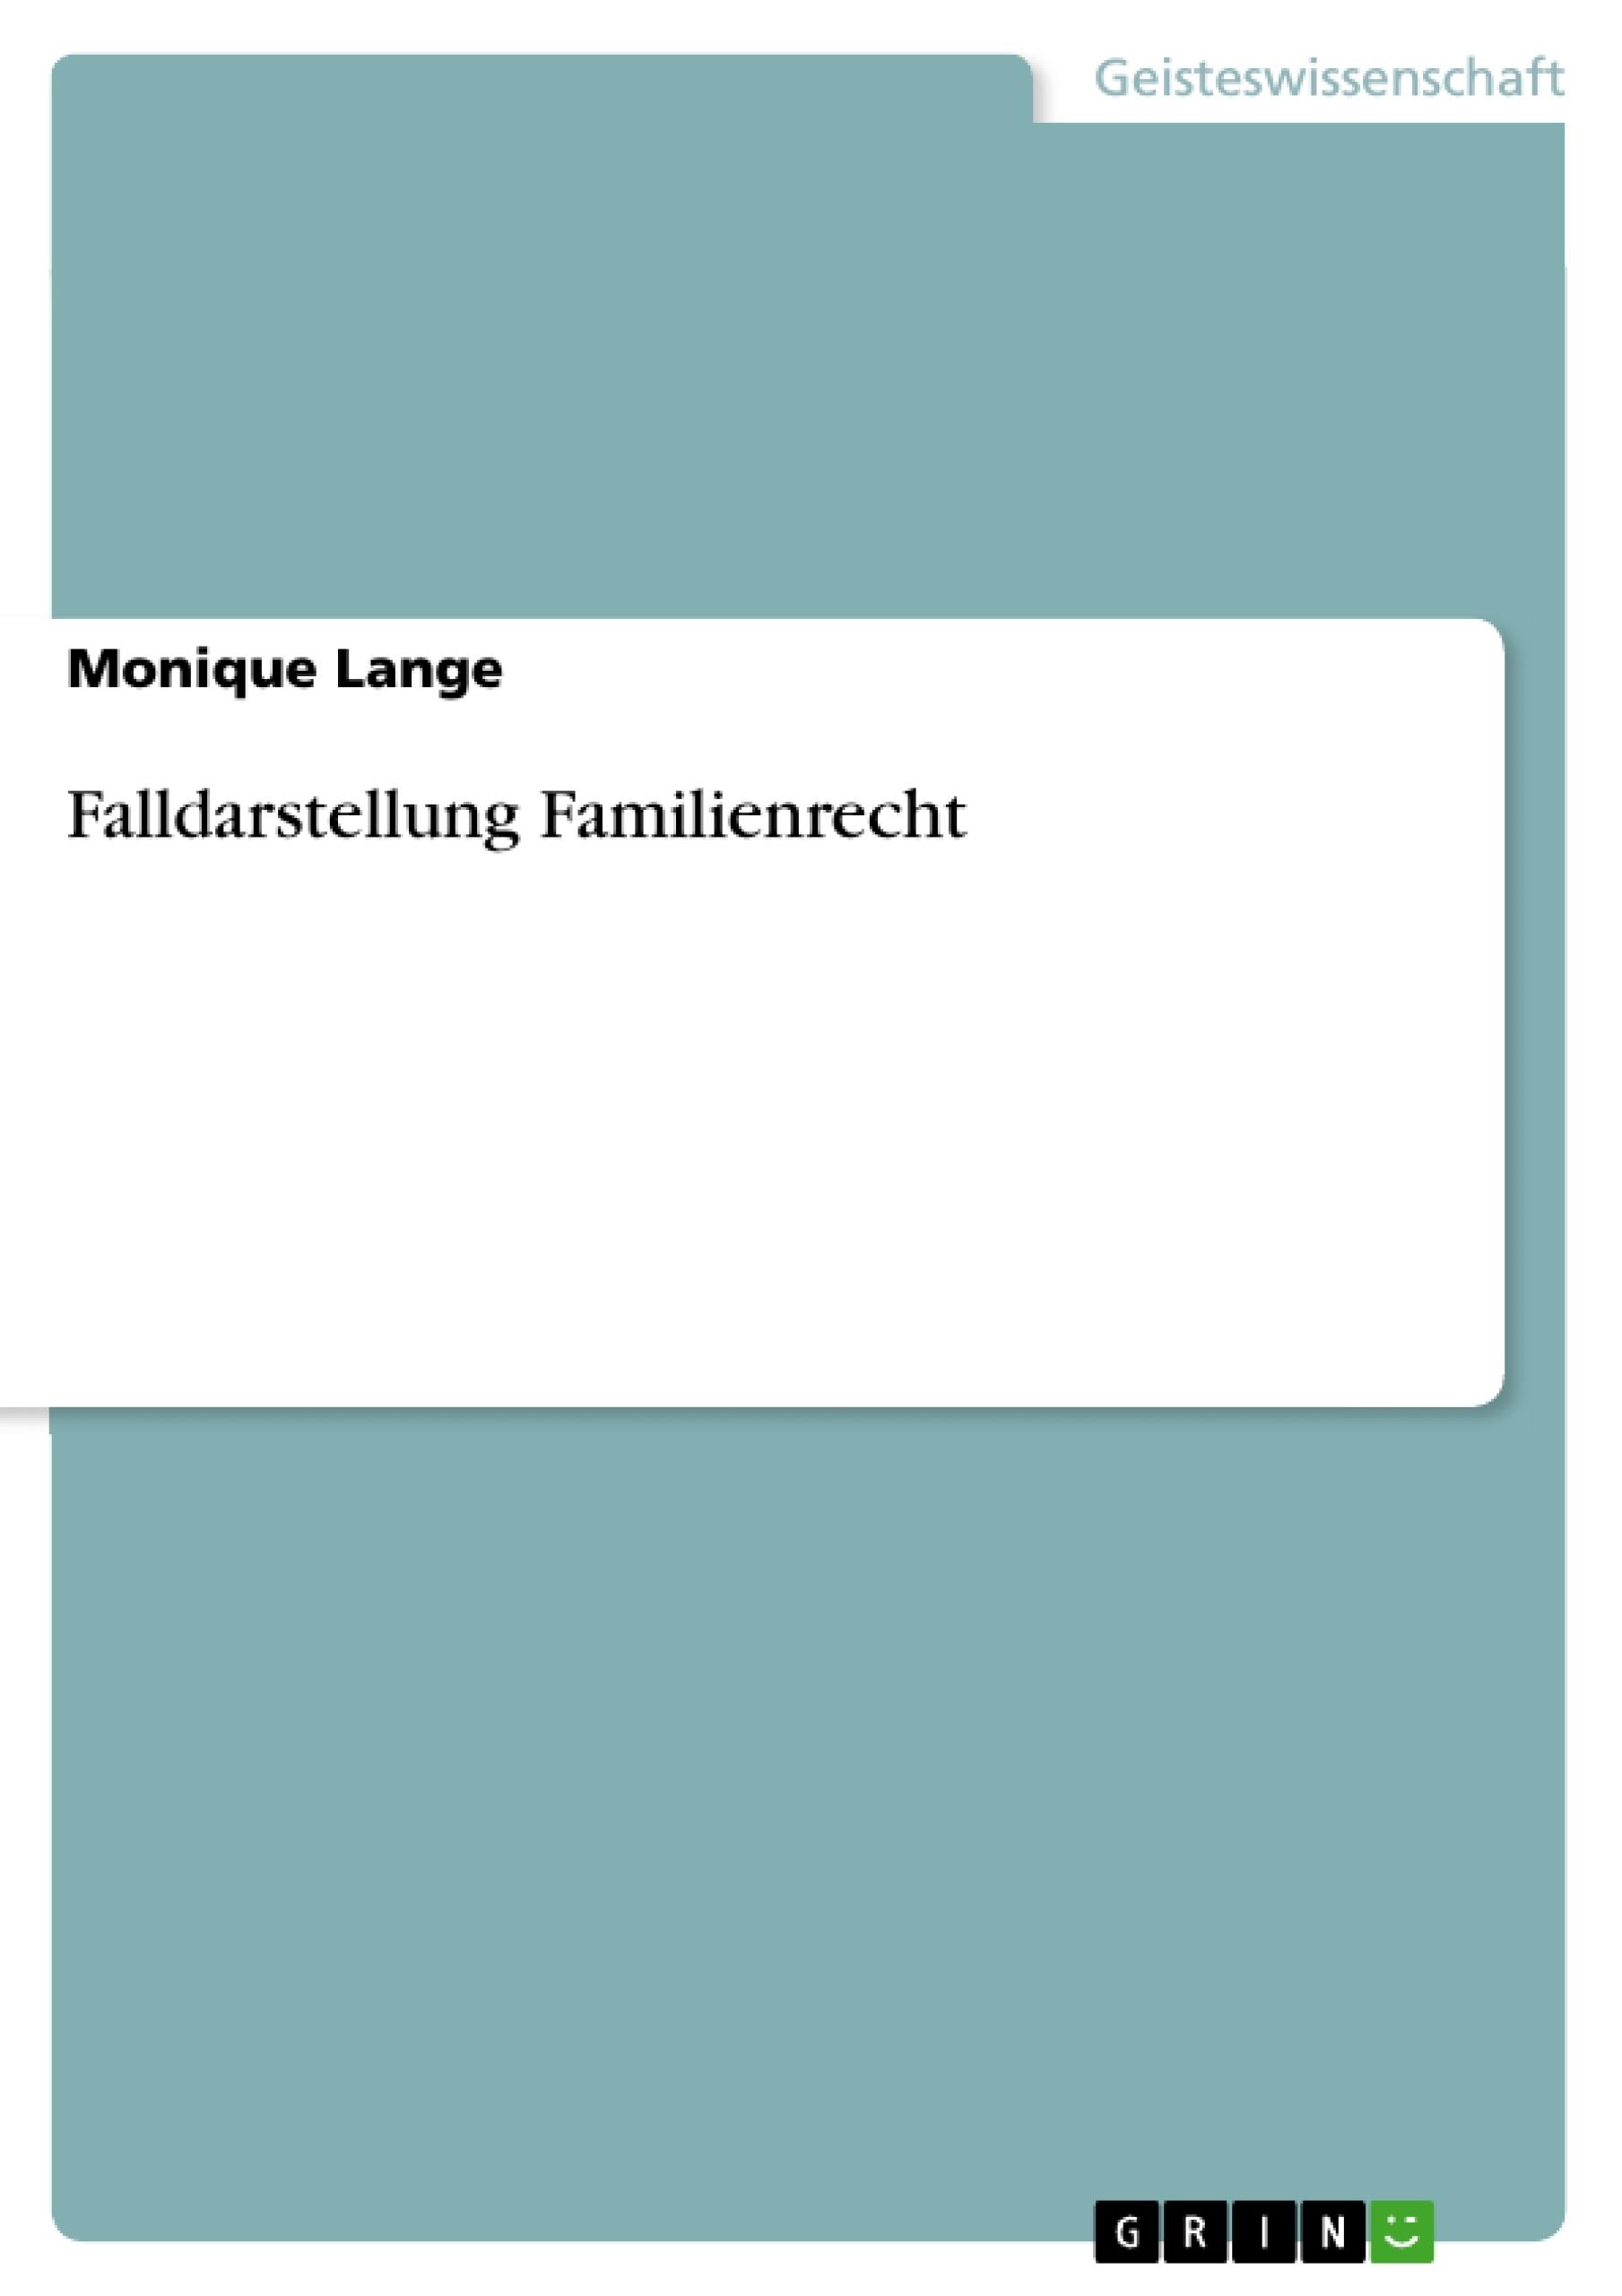 Titel: Falldarstellung Familienrecht